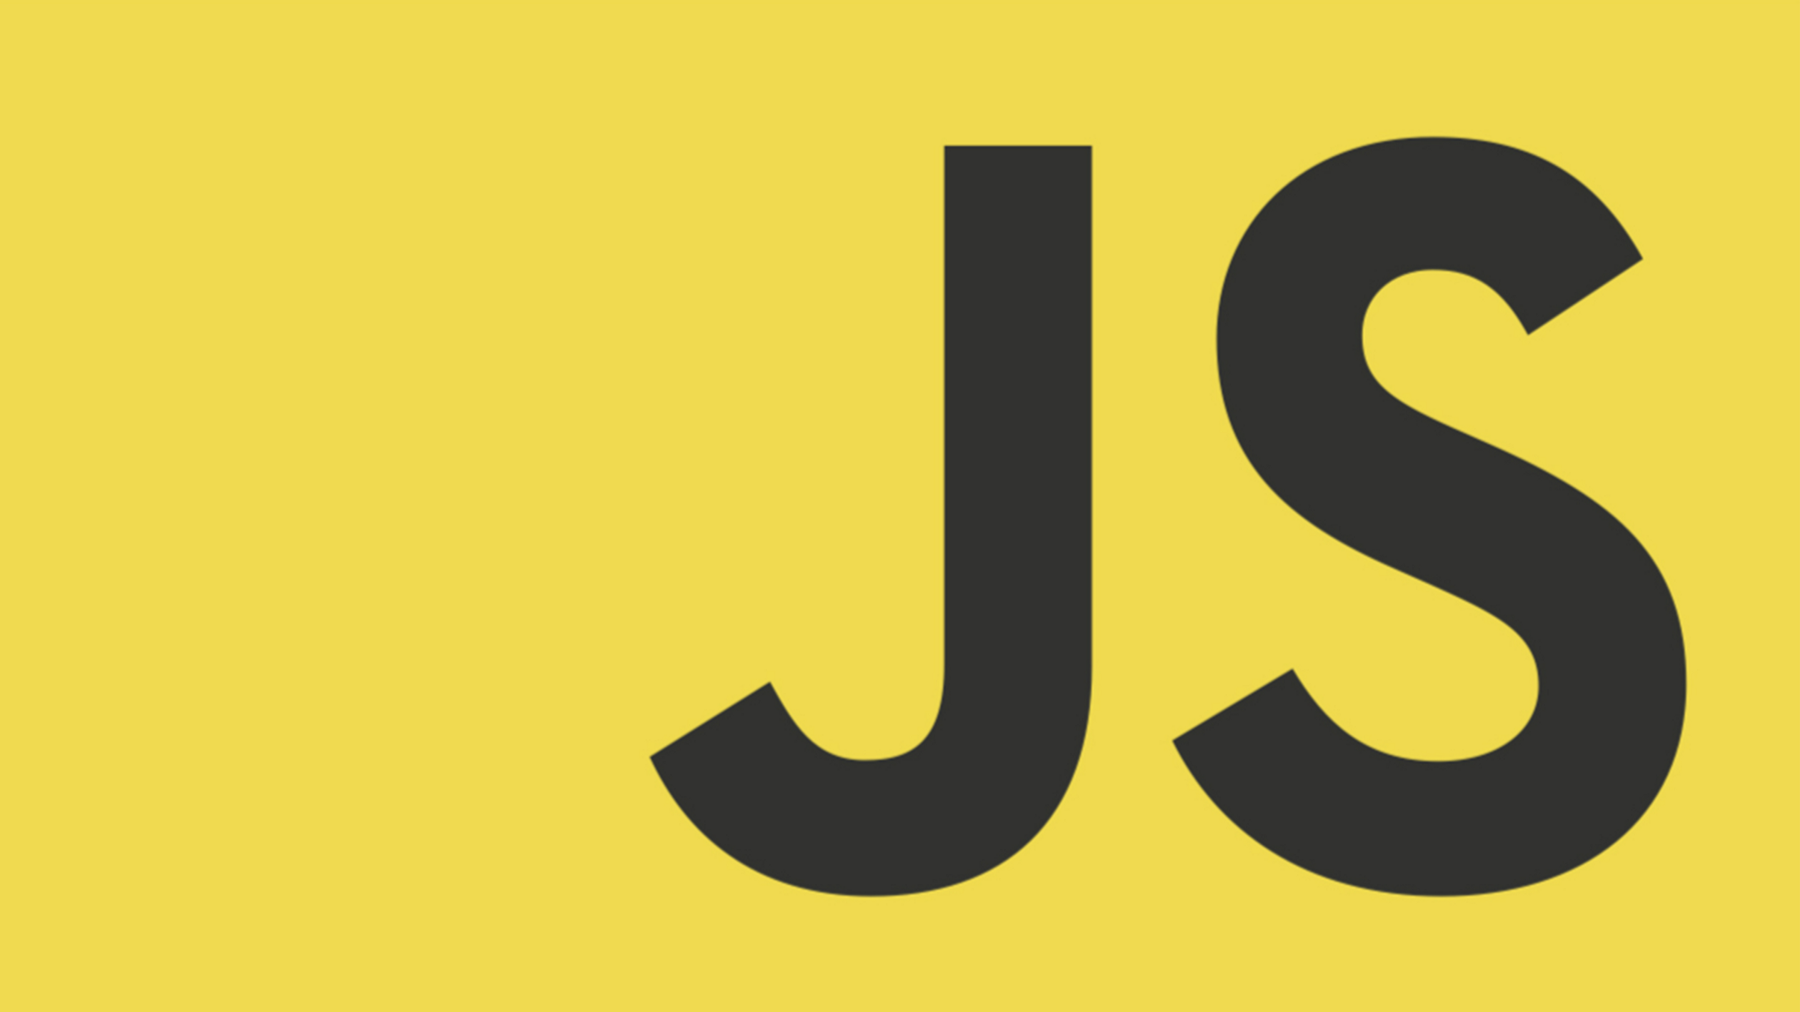 JavaScriot